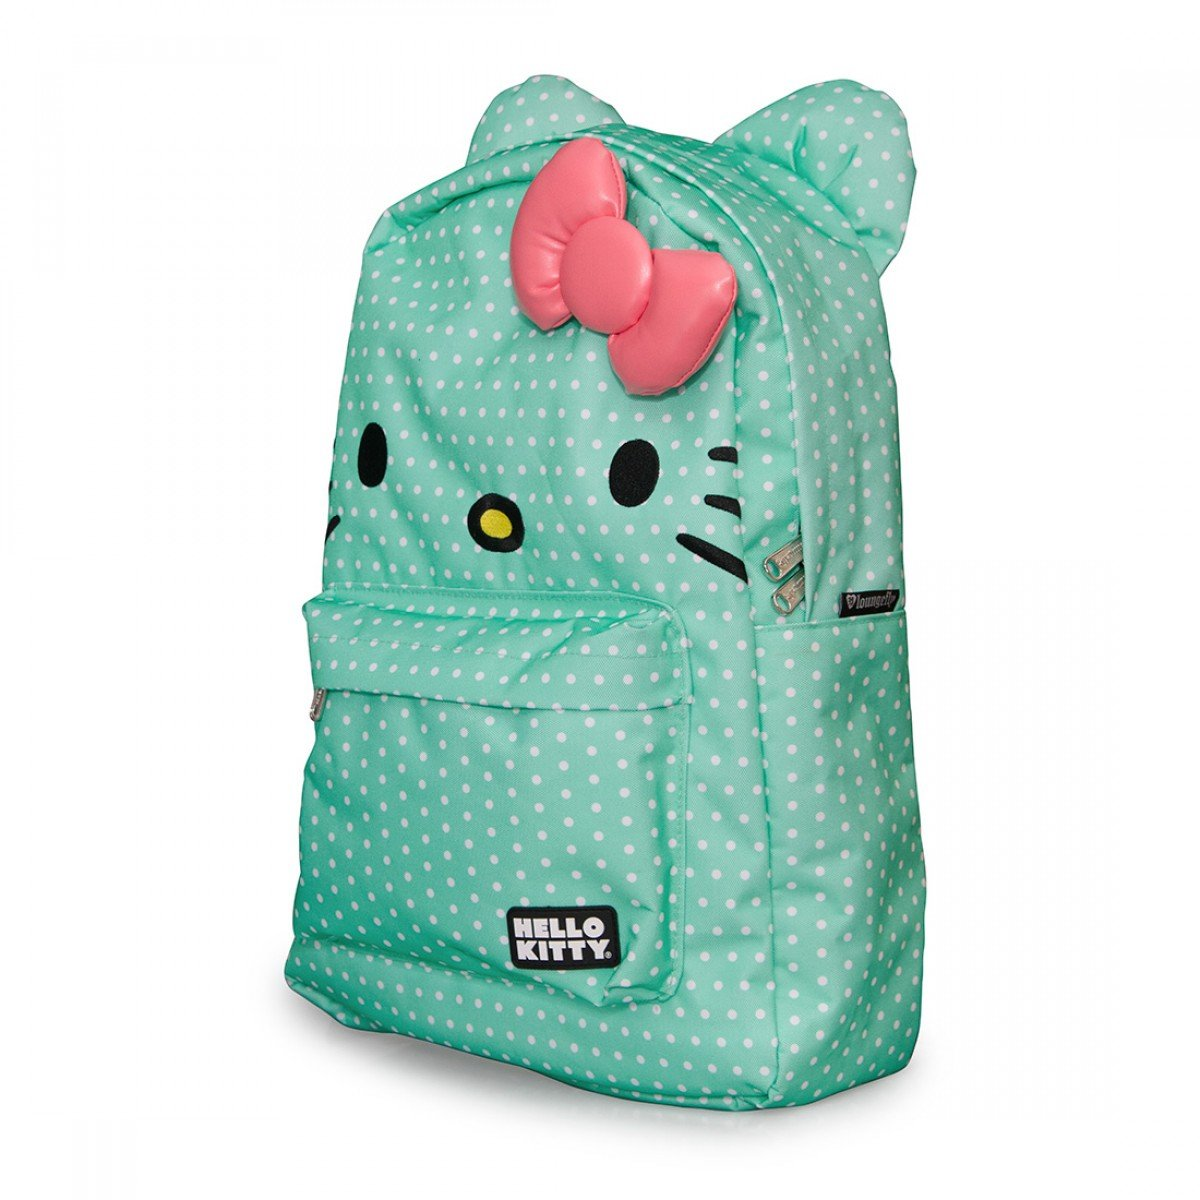 Fresh Polka Dot Mint Green Canvas School Backpacks- Fenix Toulouse ... b9f0200cb2cf6